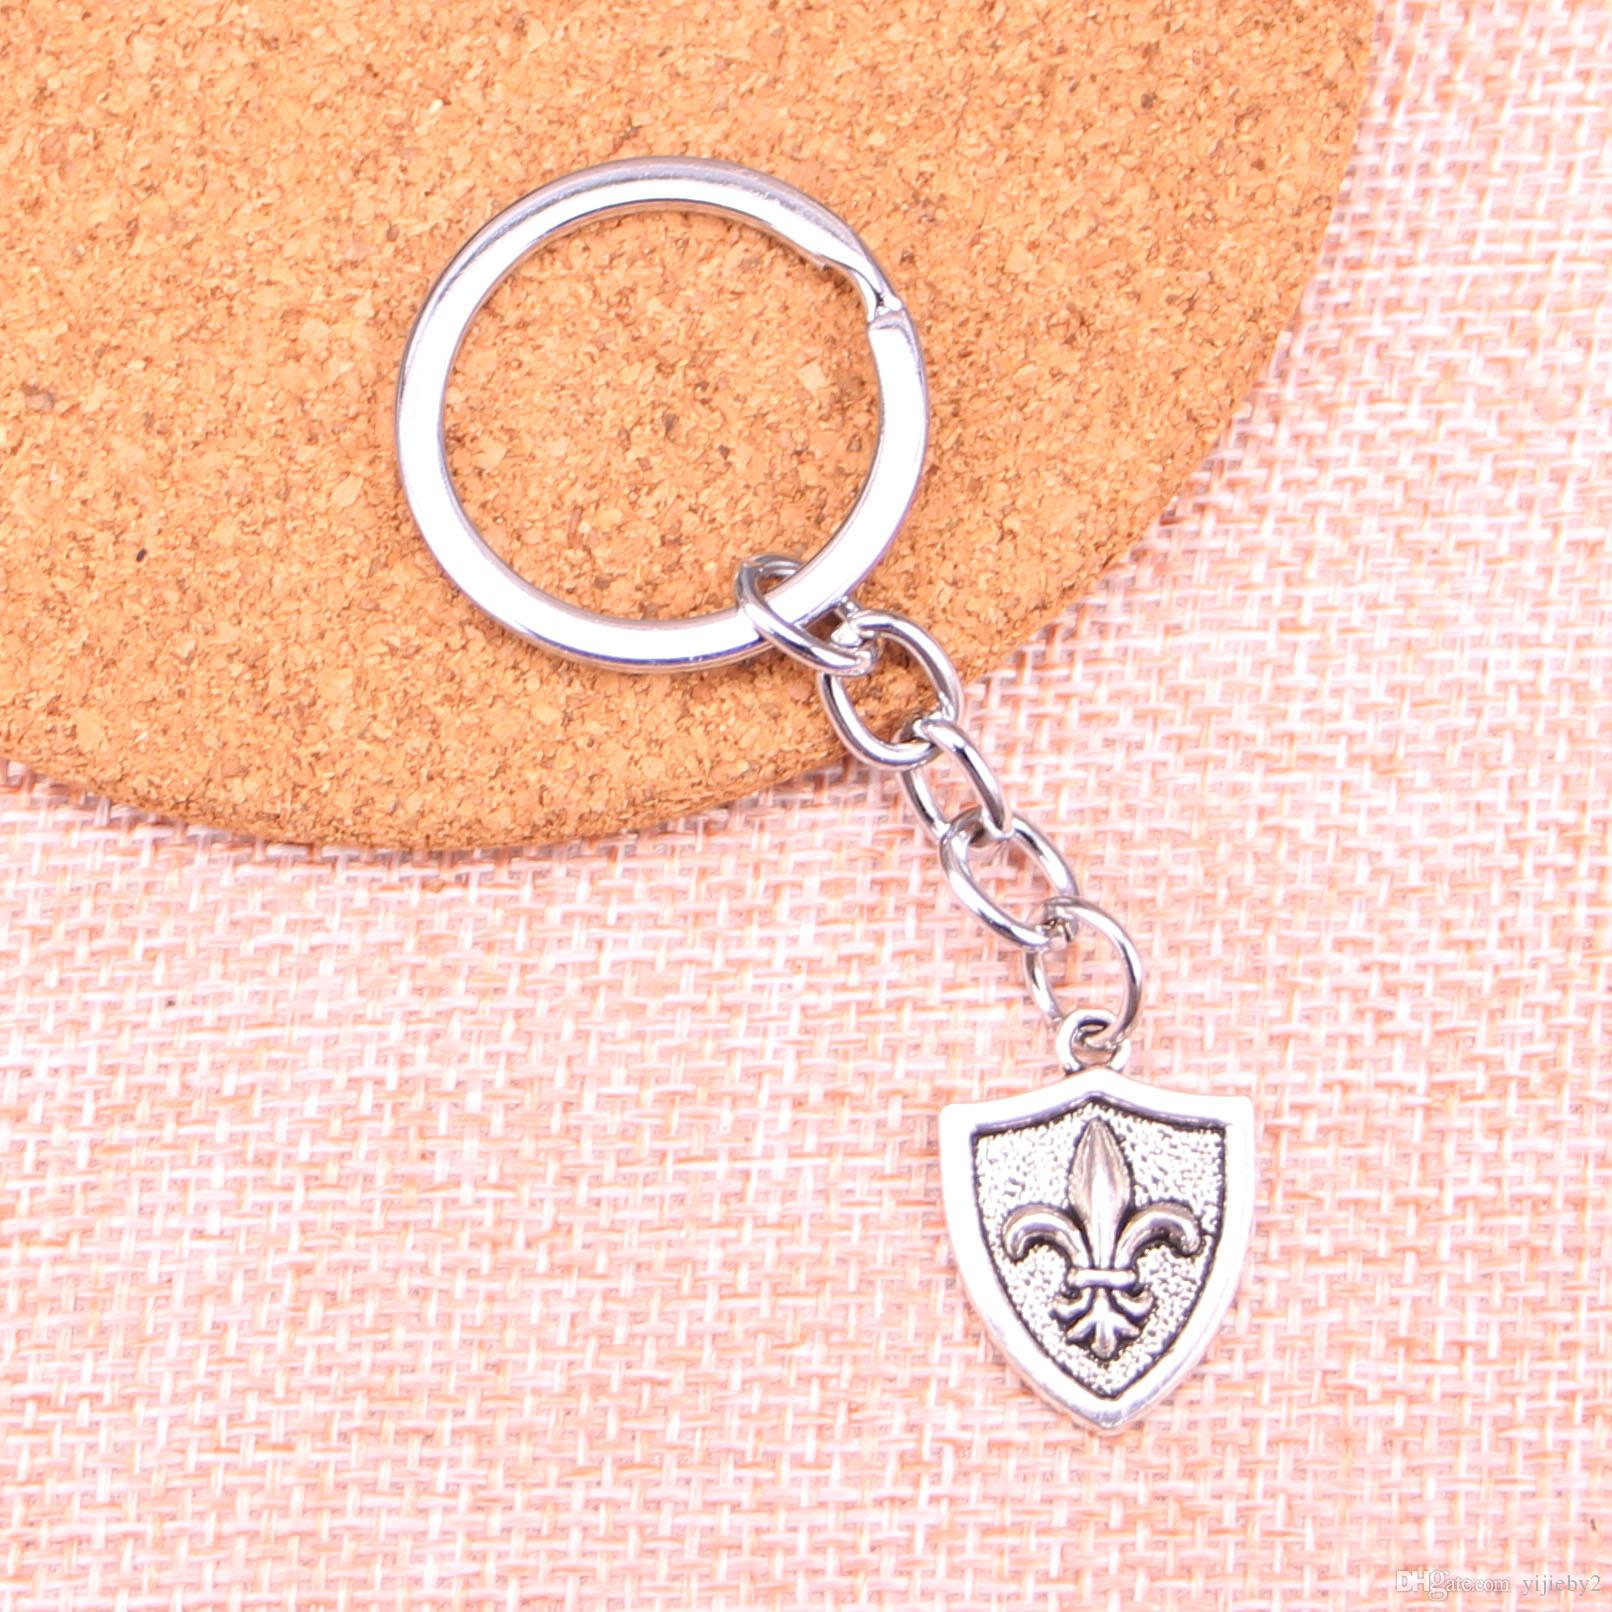 Fashion Car Keychain Silver Color Metal Key Chains Accessory Vintage FLEUR DE LIS Key Rings